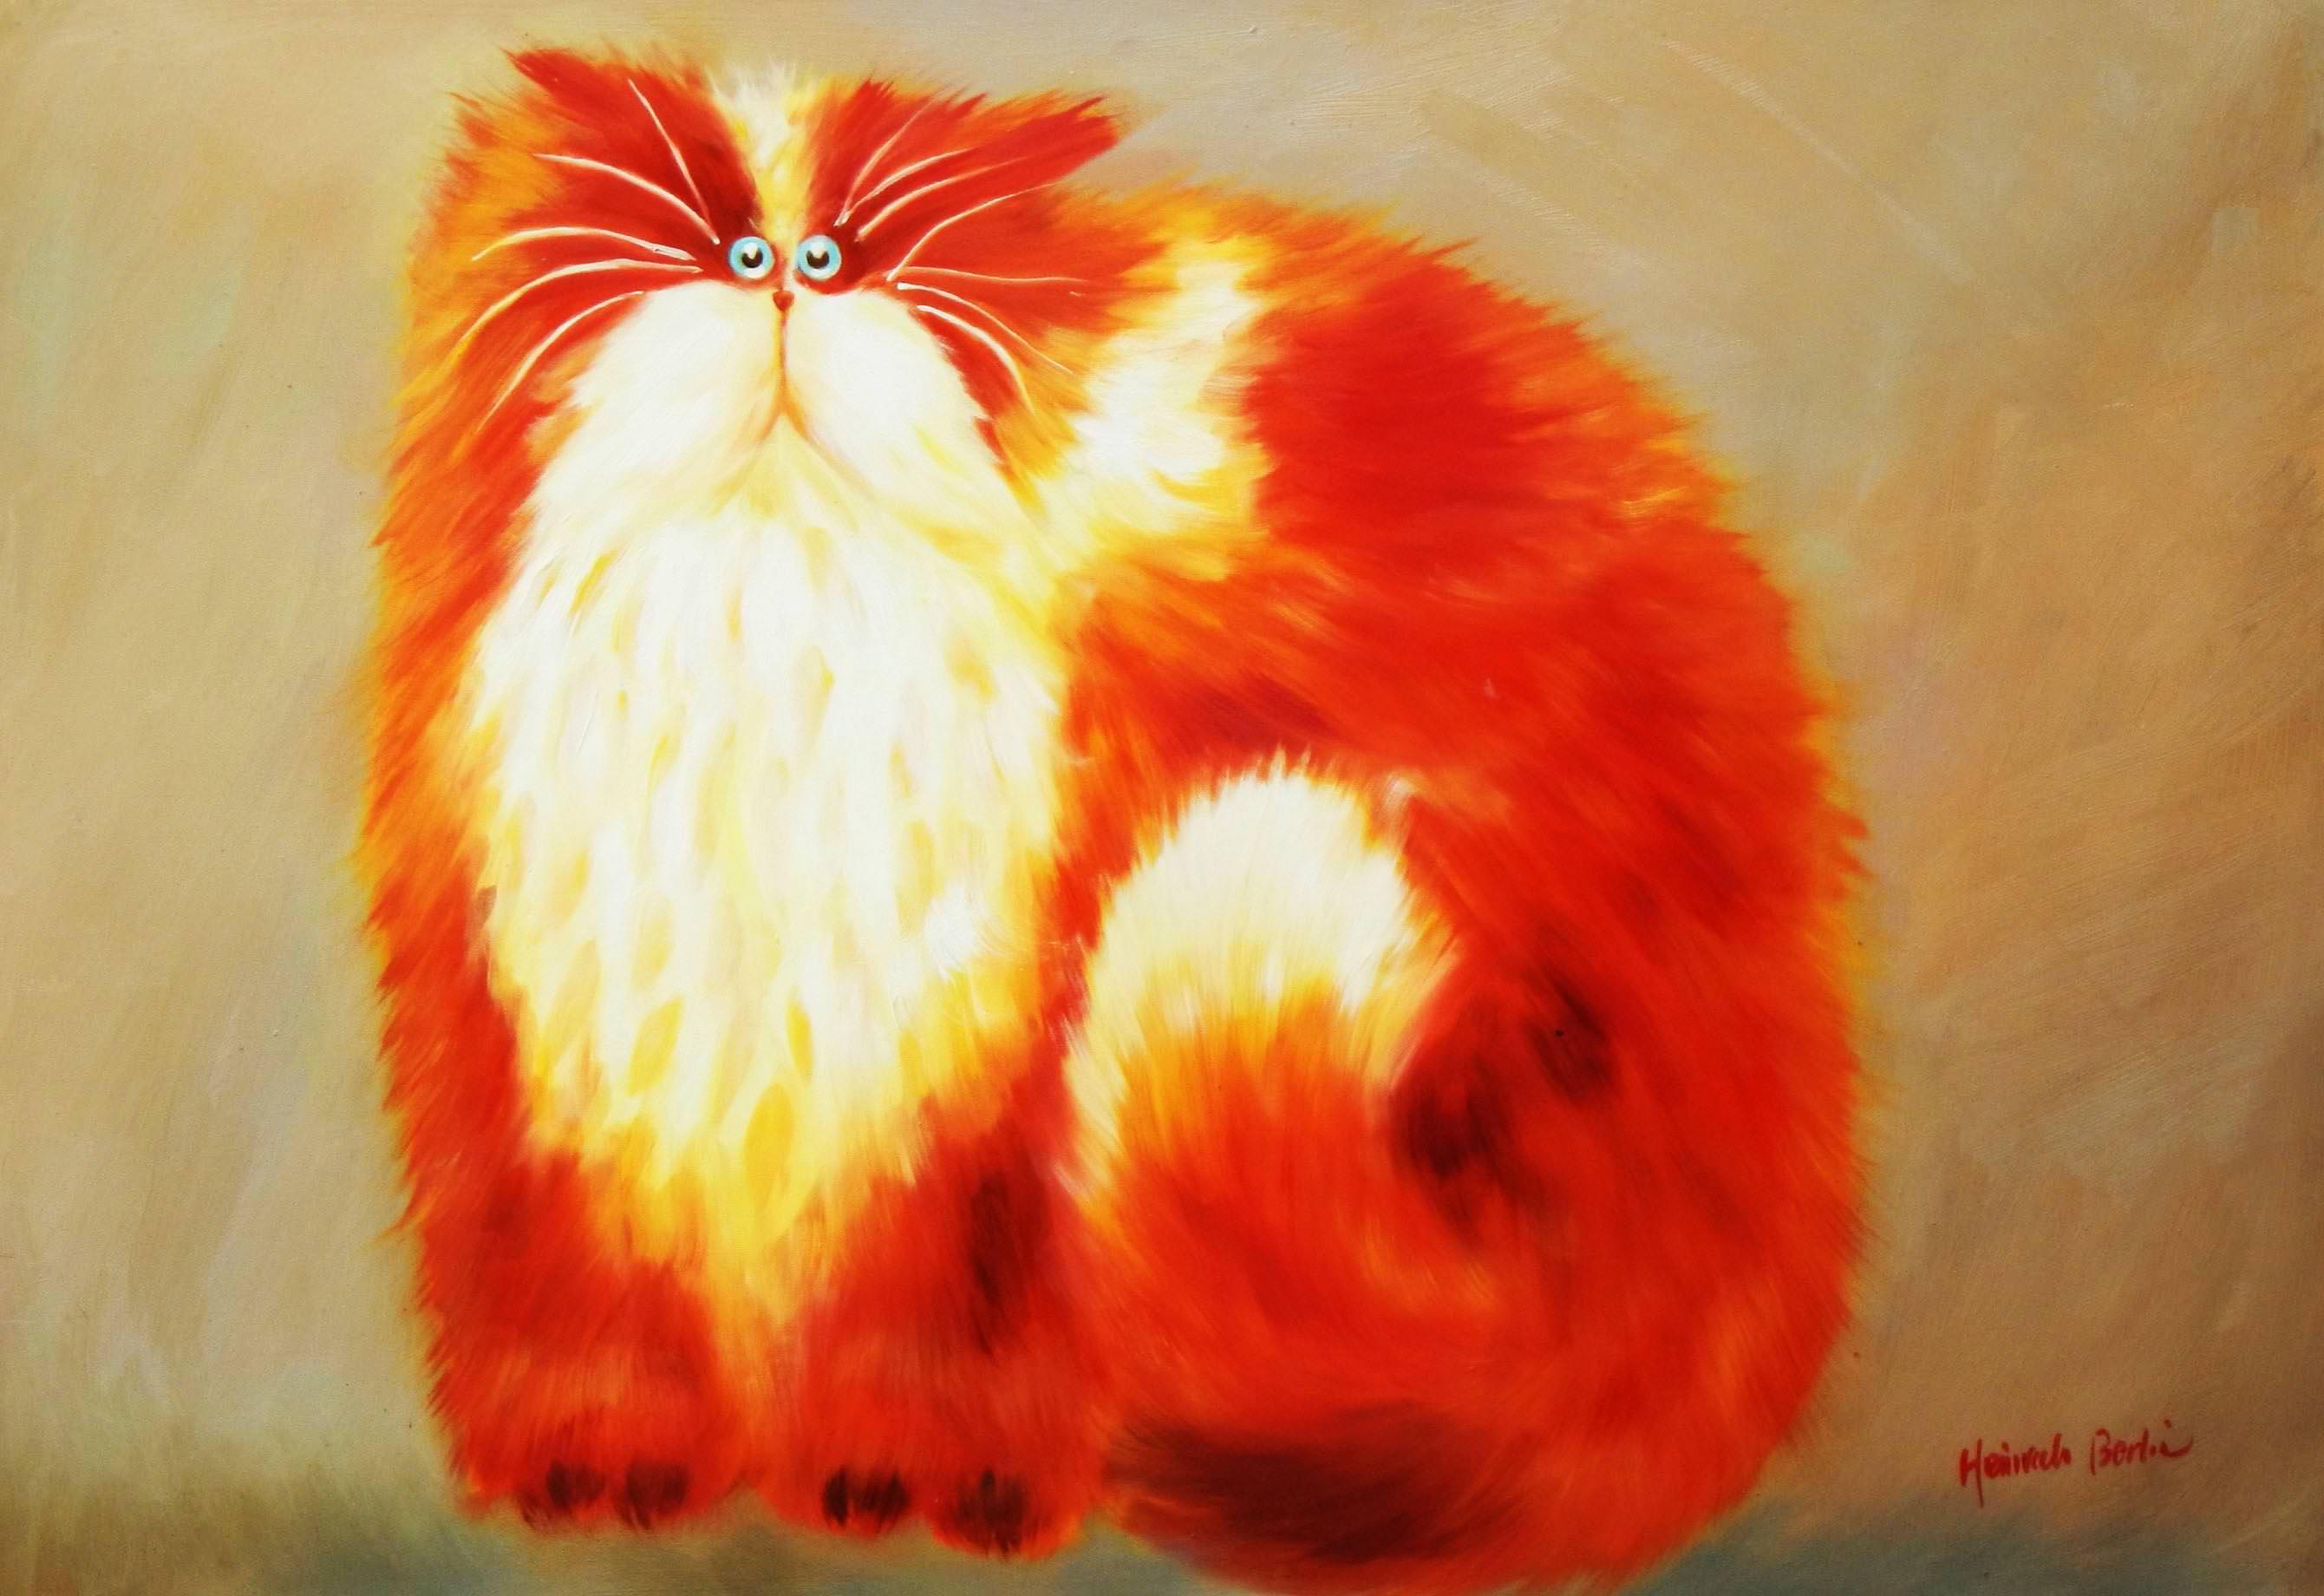 Pop Art - Pummel Kater Garfield d93681 60x90cm lustiges Ölbild handgemalt